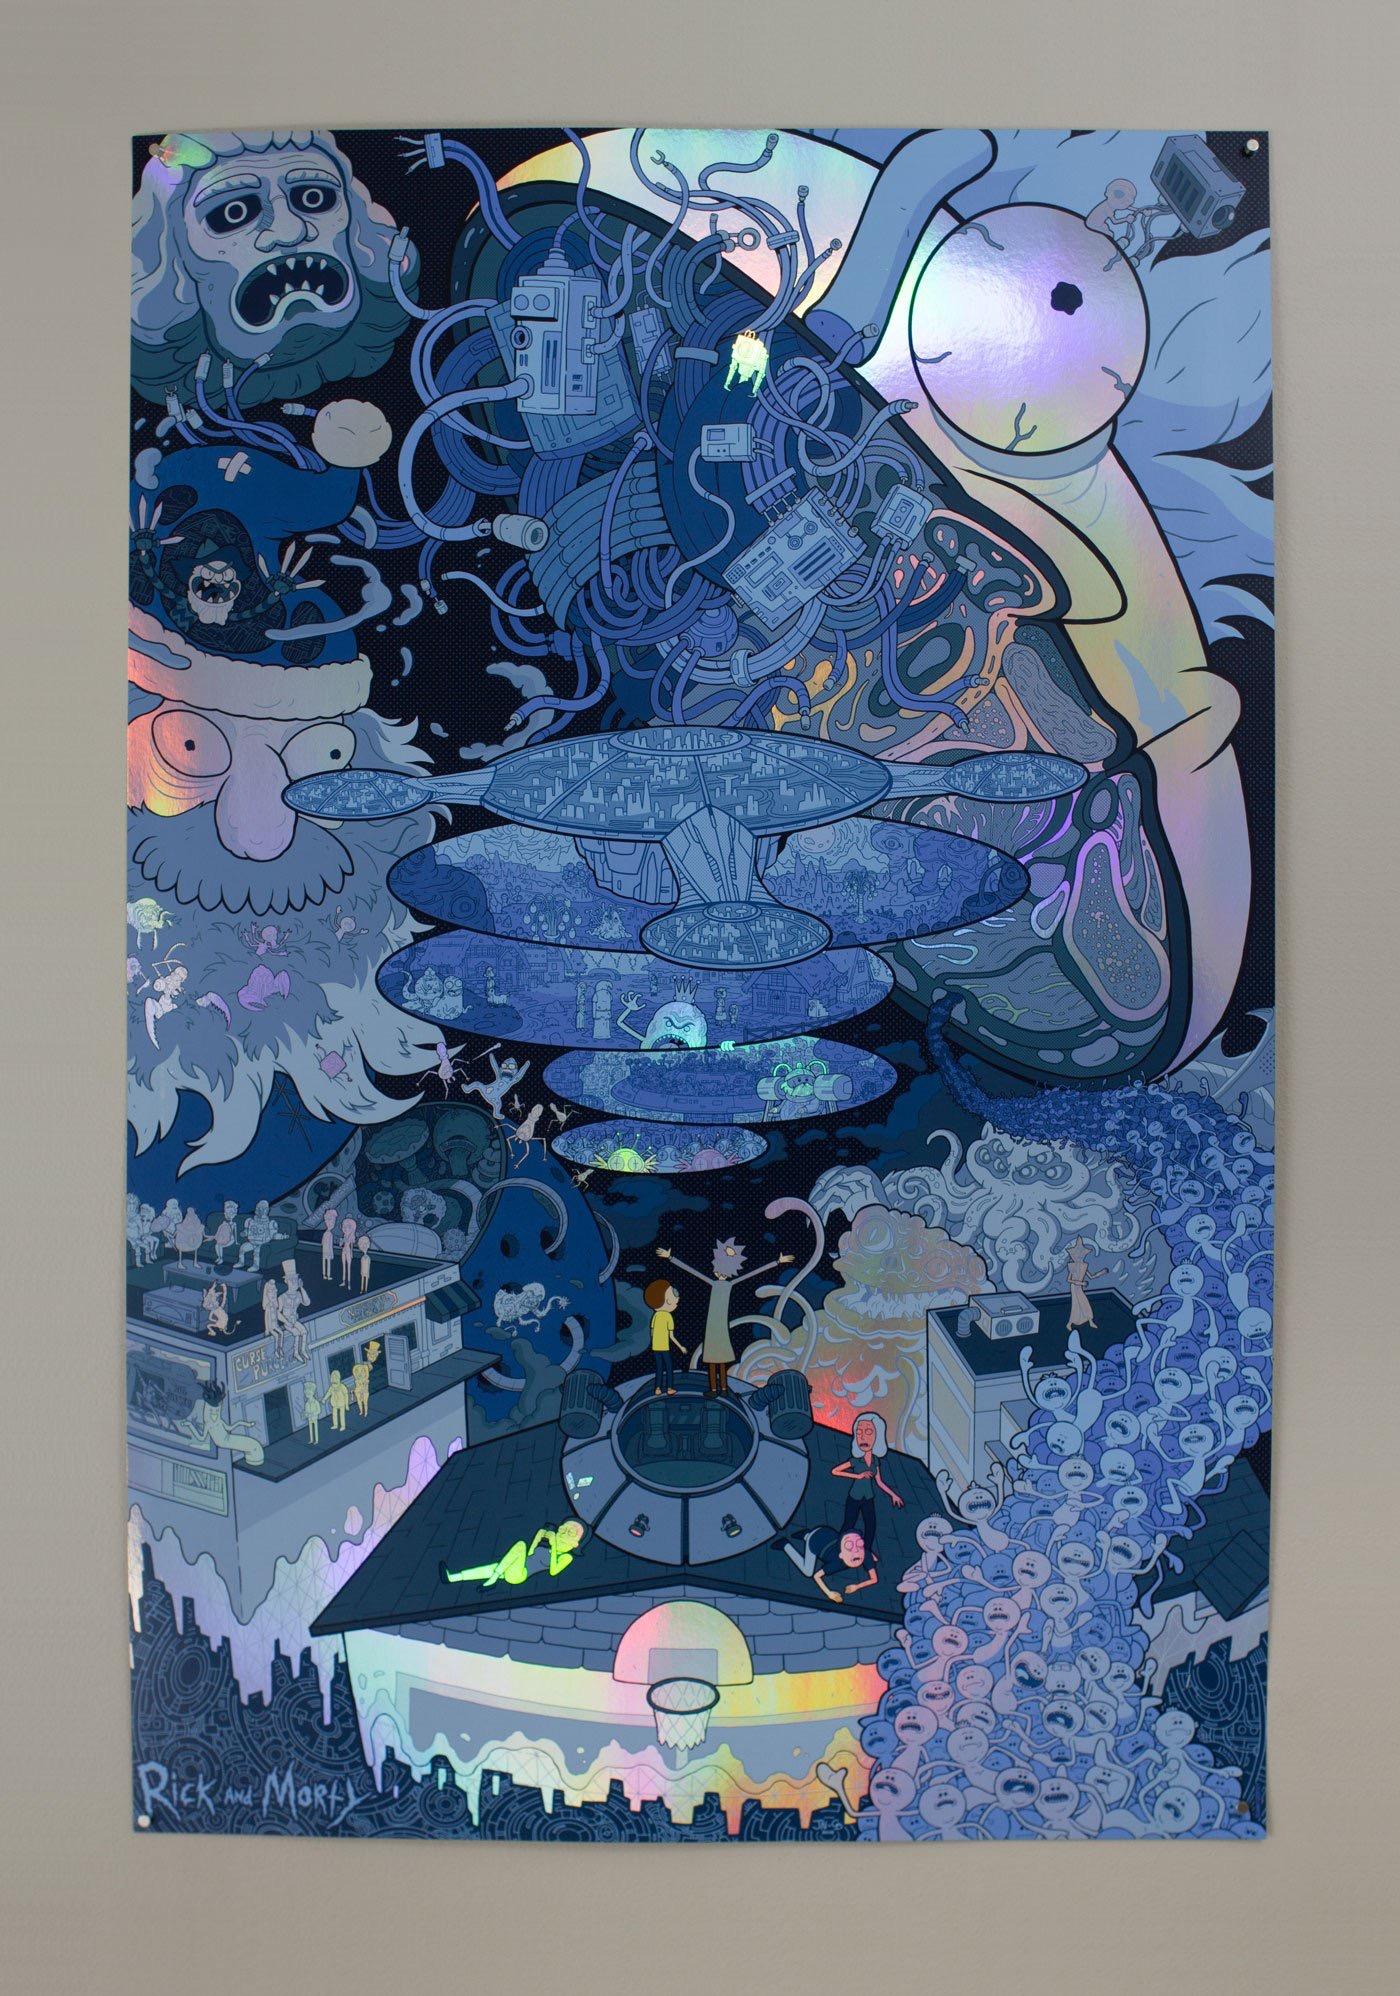 Rick and Morty: Season 1 - Artist Variant